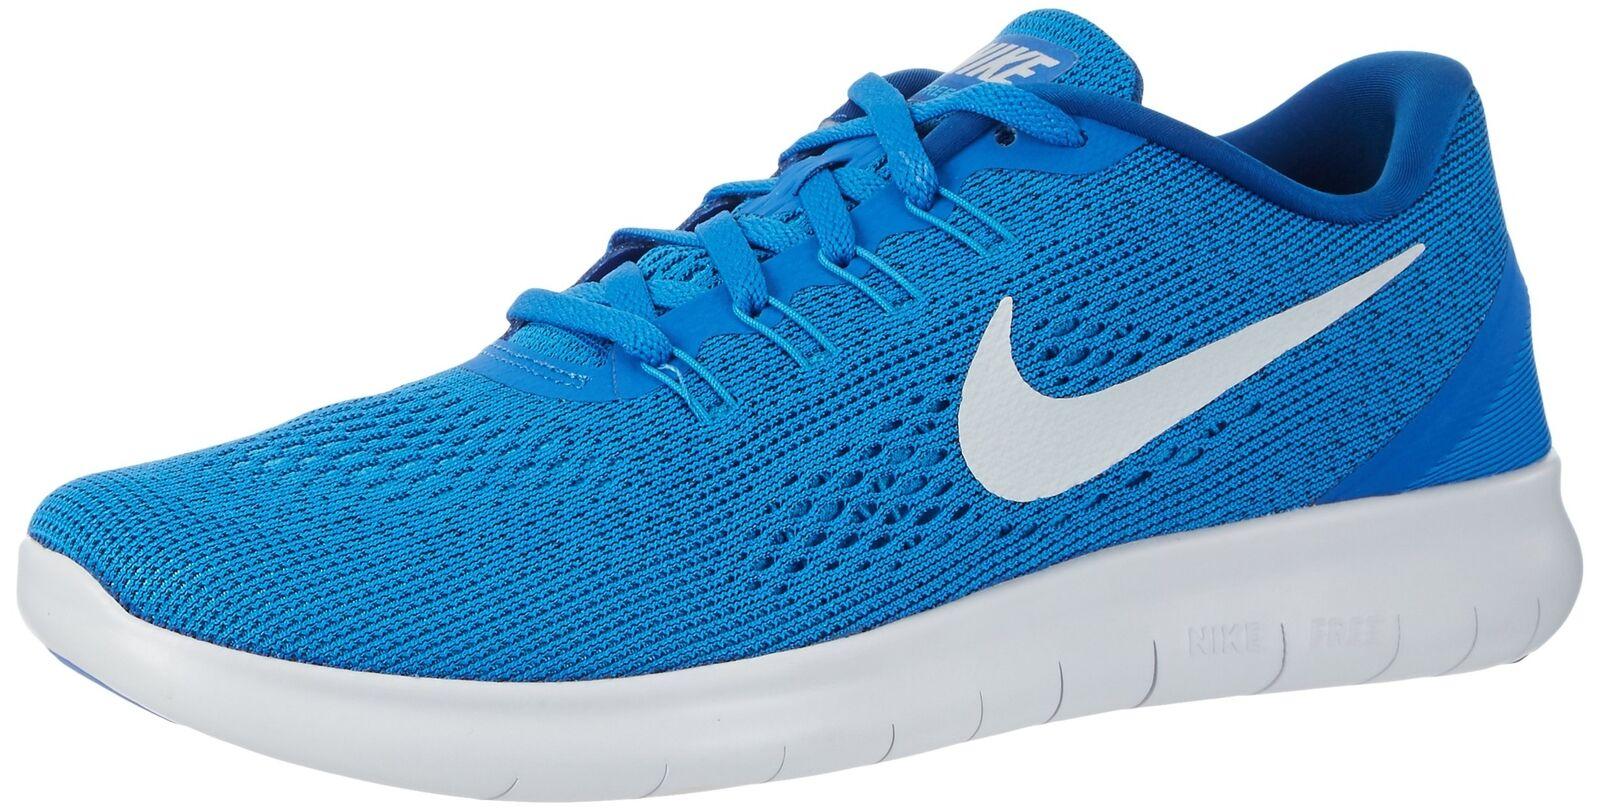 Nike Free RN Soar Pure Platinum bluee Glow Team Royal Men's Running size 10.5